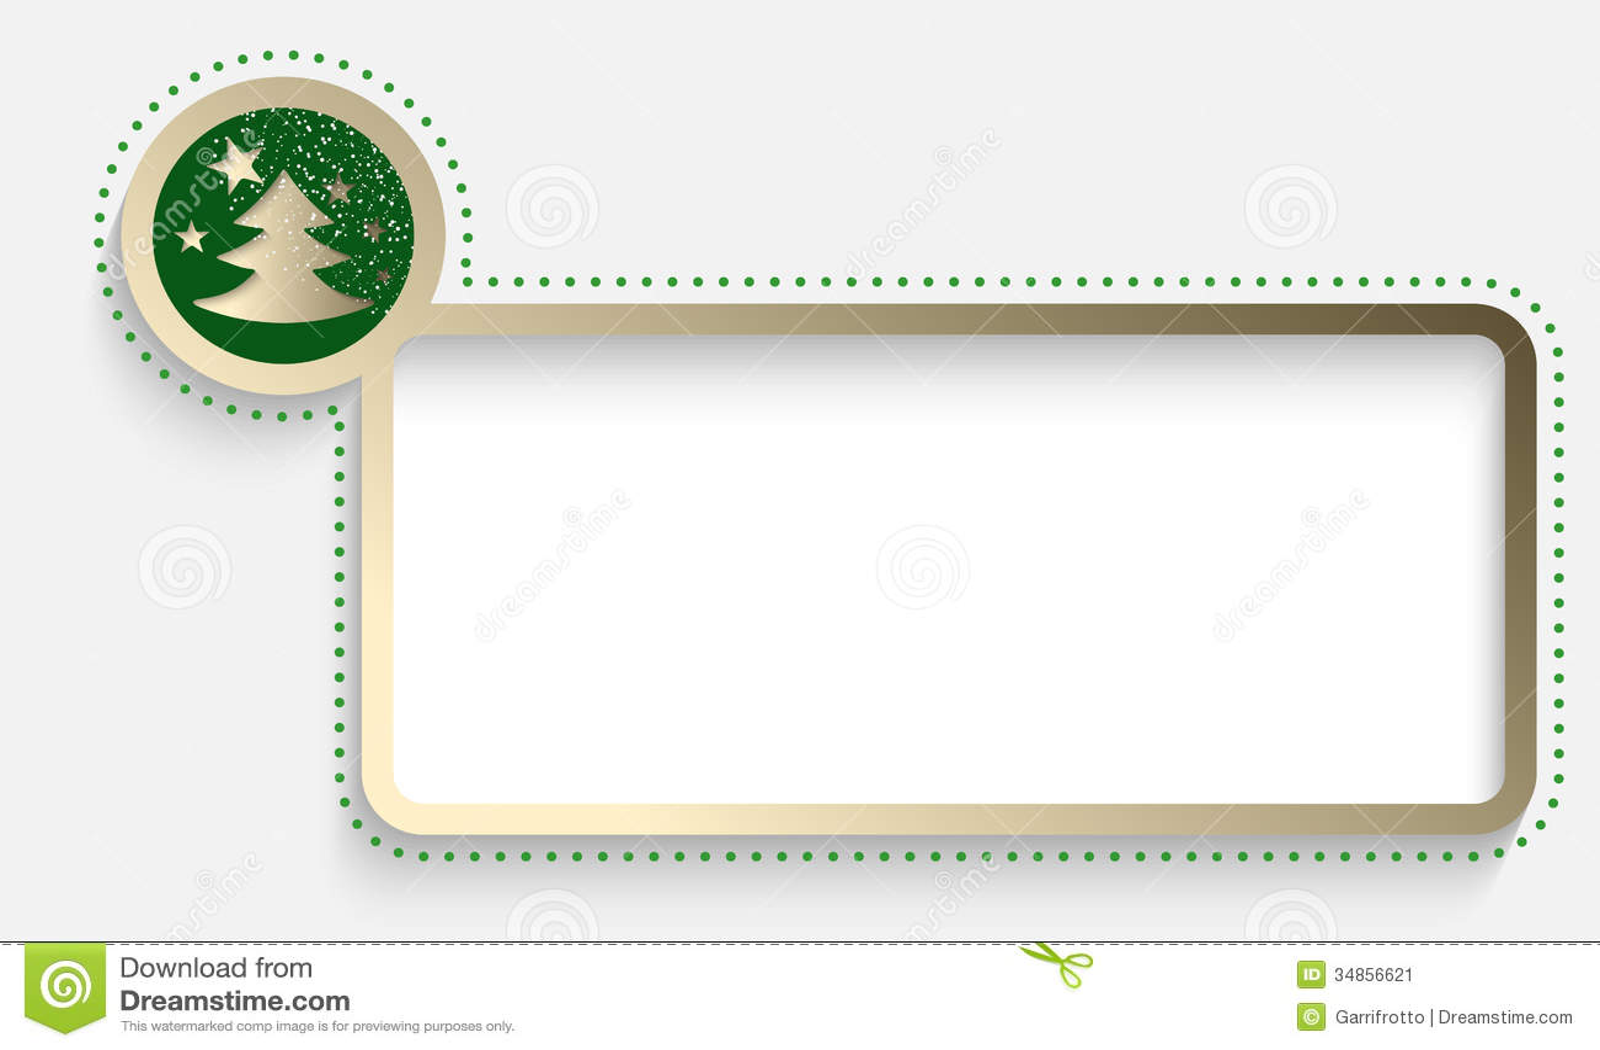 Free Christmas Tree Template